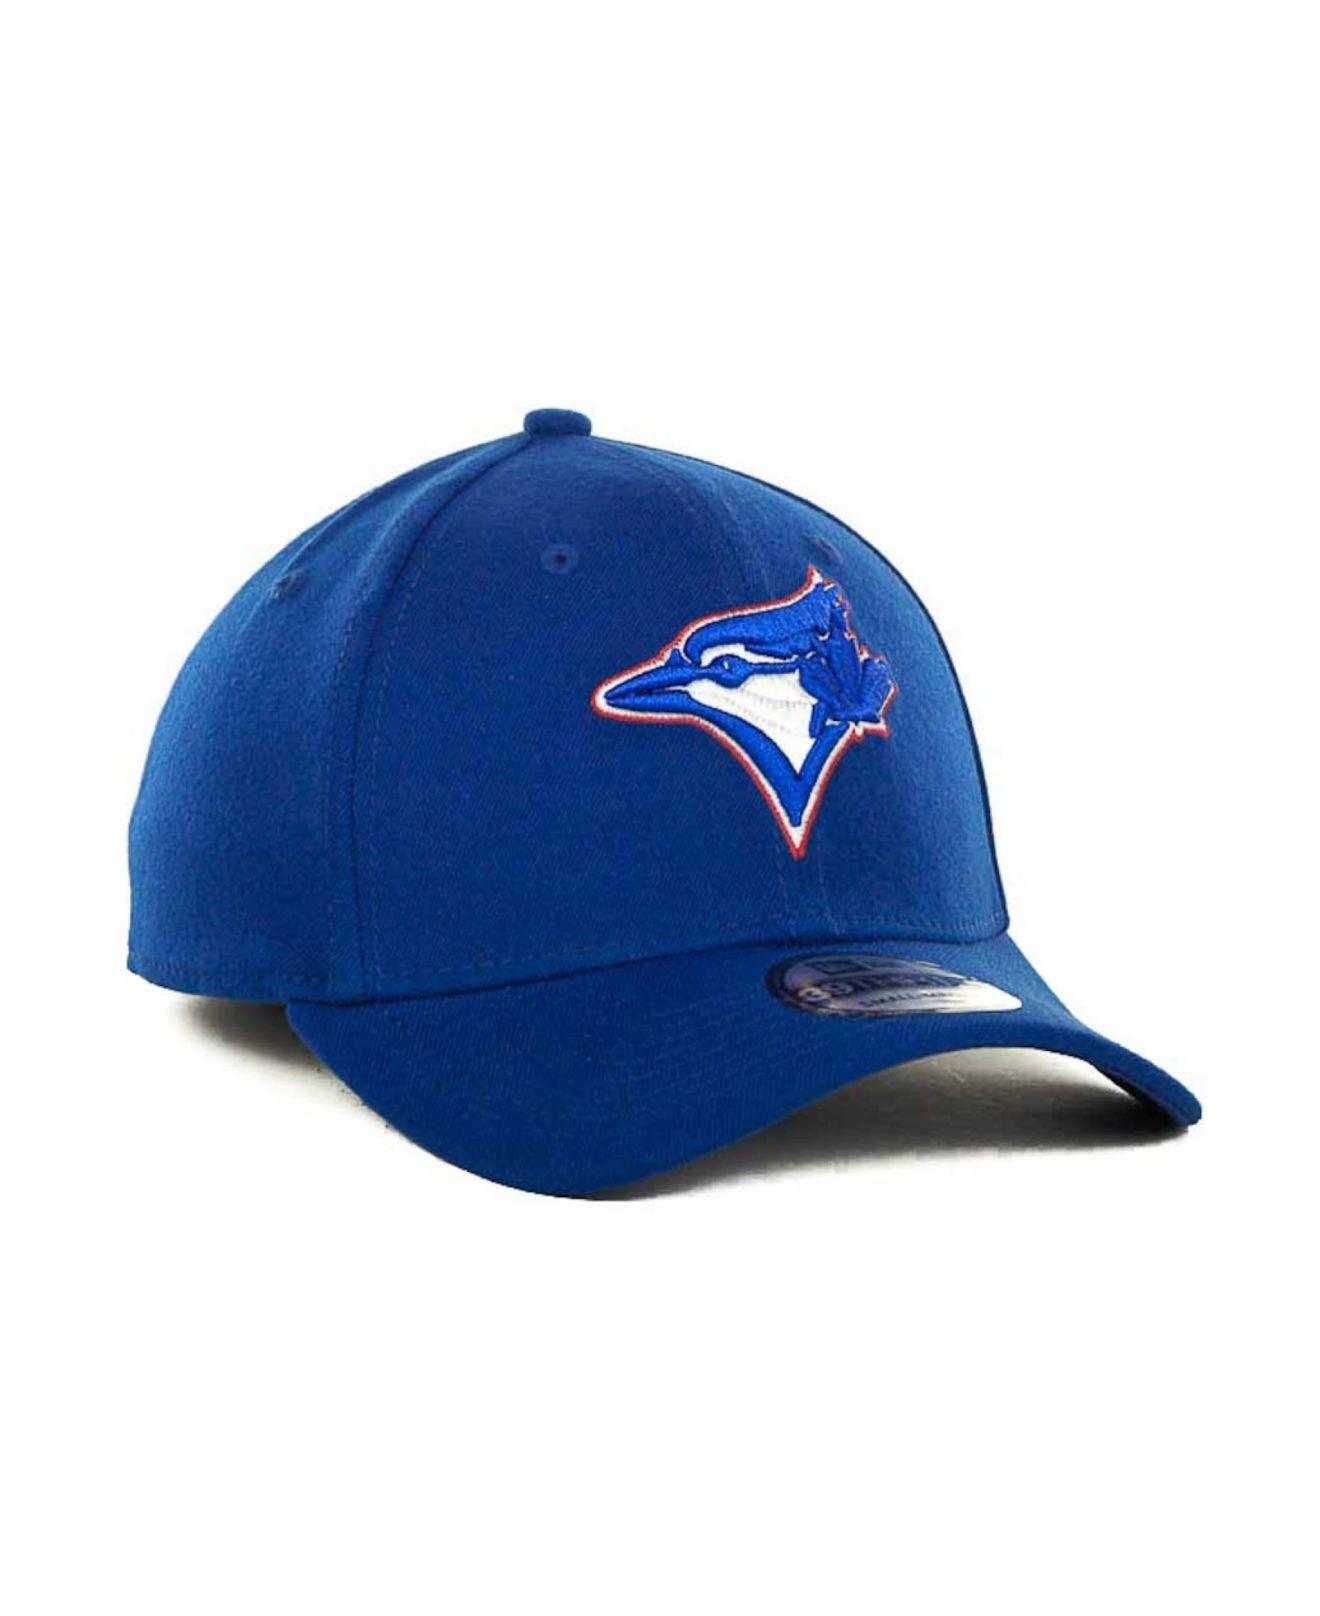 Ktz Toronto Blue Jays Team Color Tonal Ace 39thirty Cap In